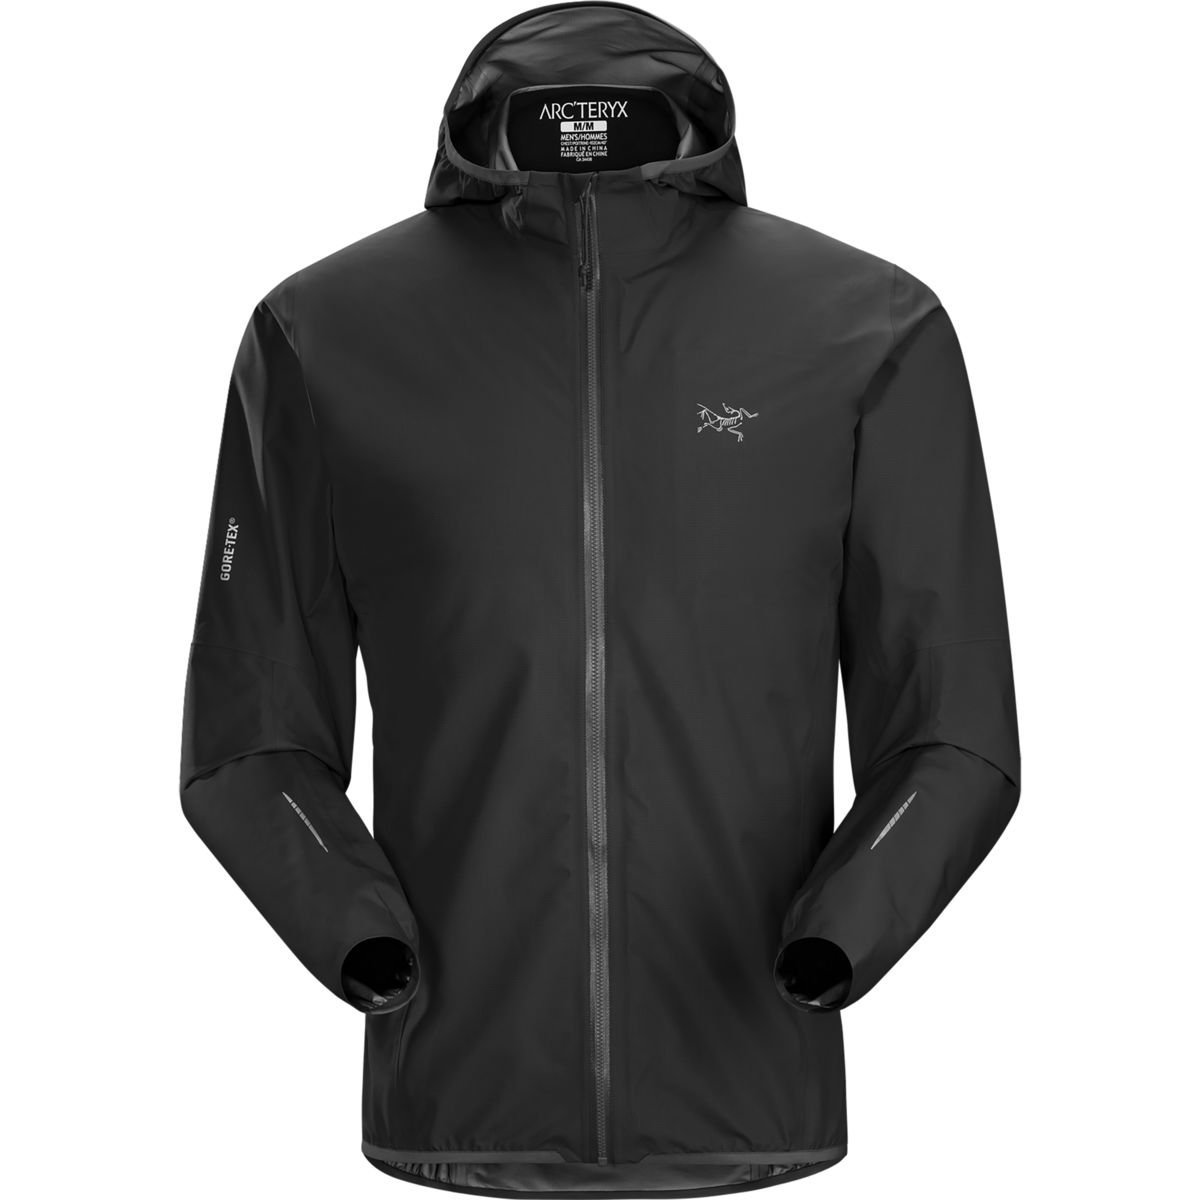 Arcteryx Norvan Jacket – Men 's B0163TSLBG X-Large|ブラック ブラック X-Large